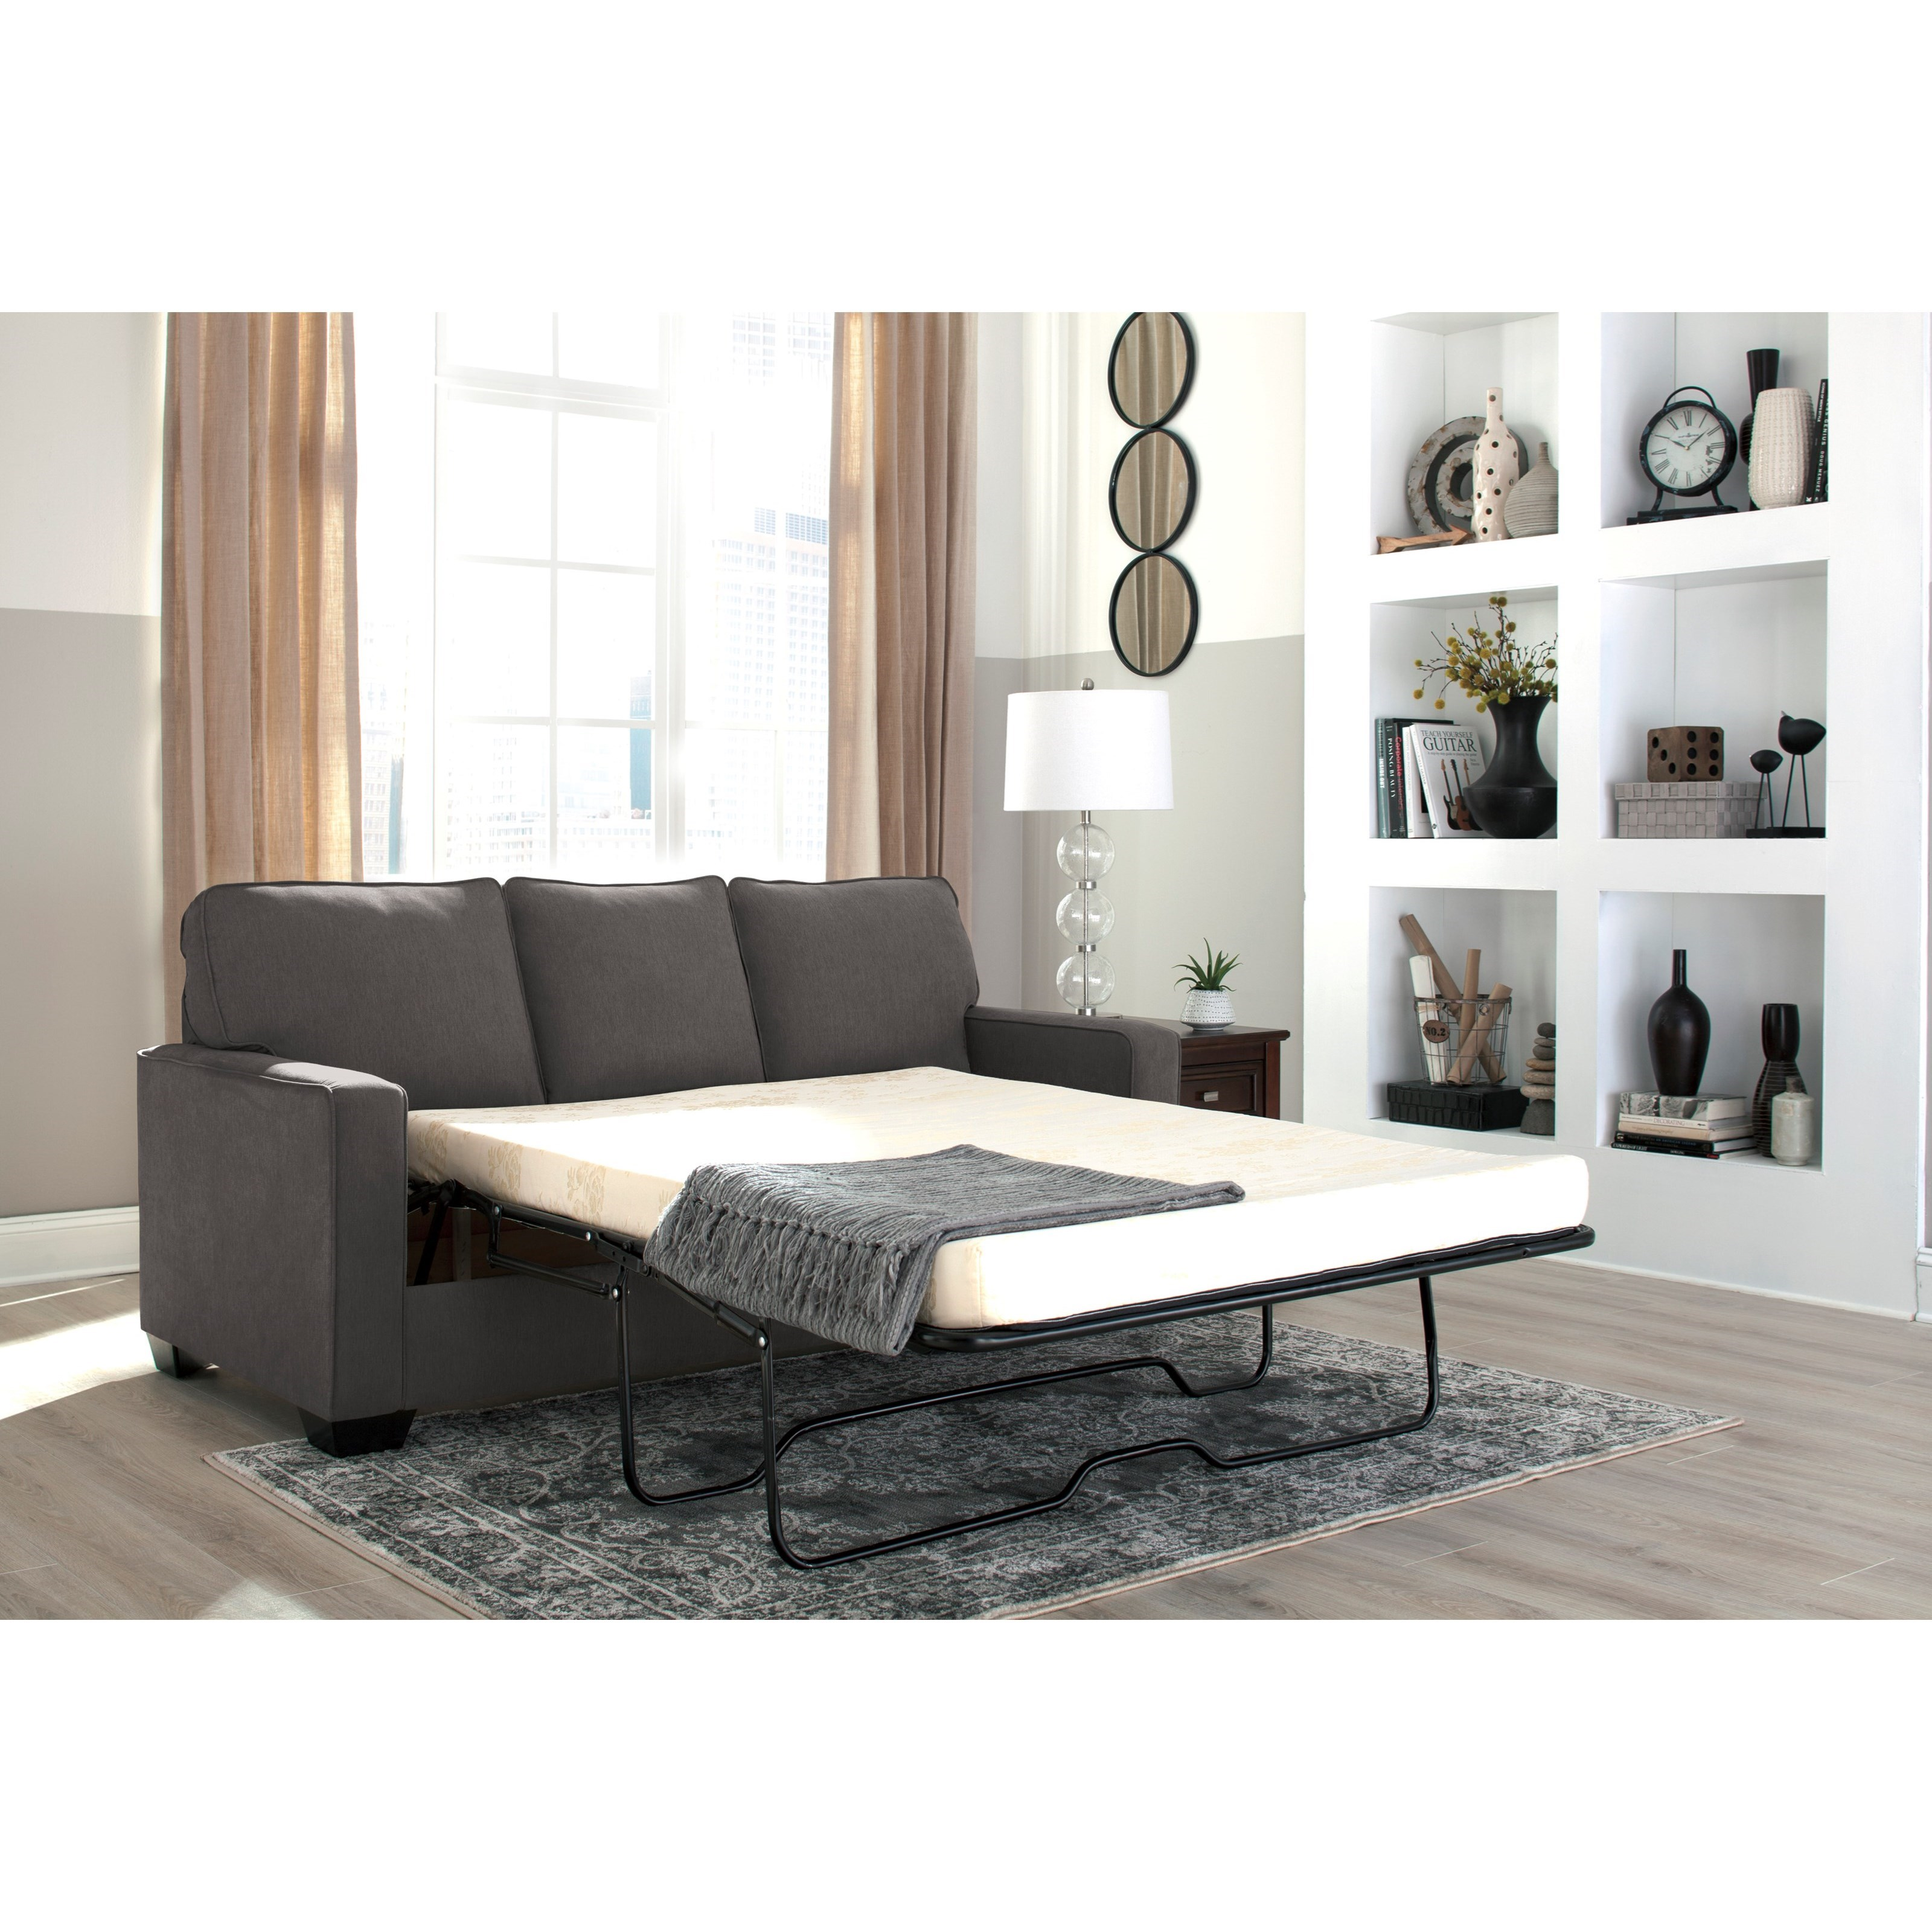 Signature Design By Ashley Zeb 3590136 Full Sofa Sleeper